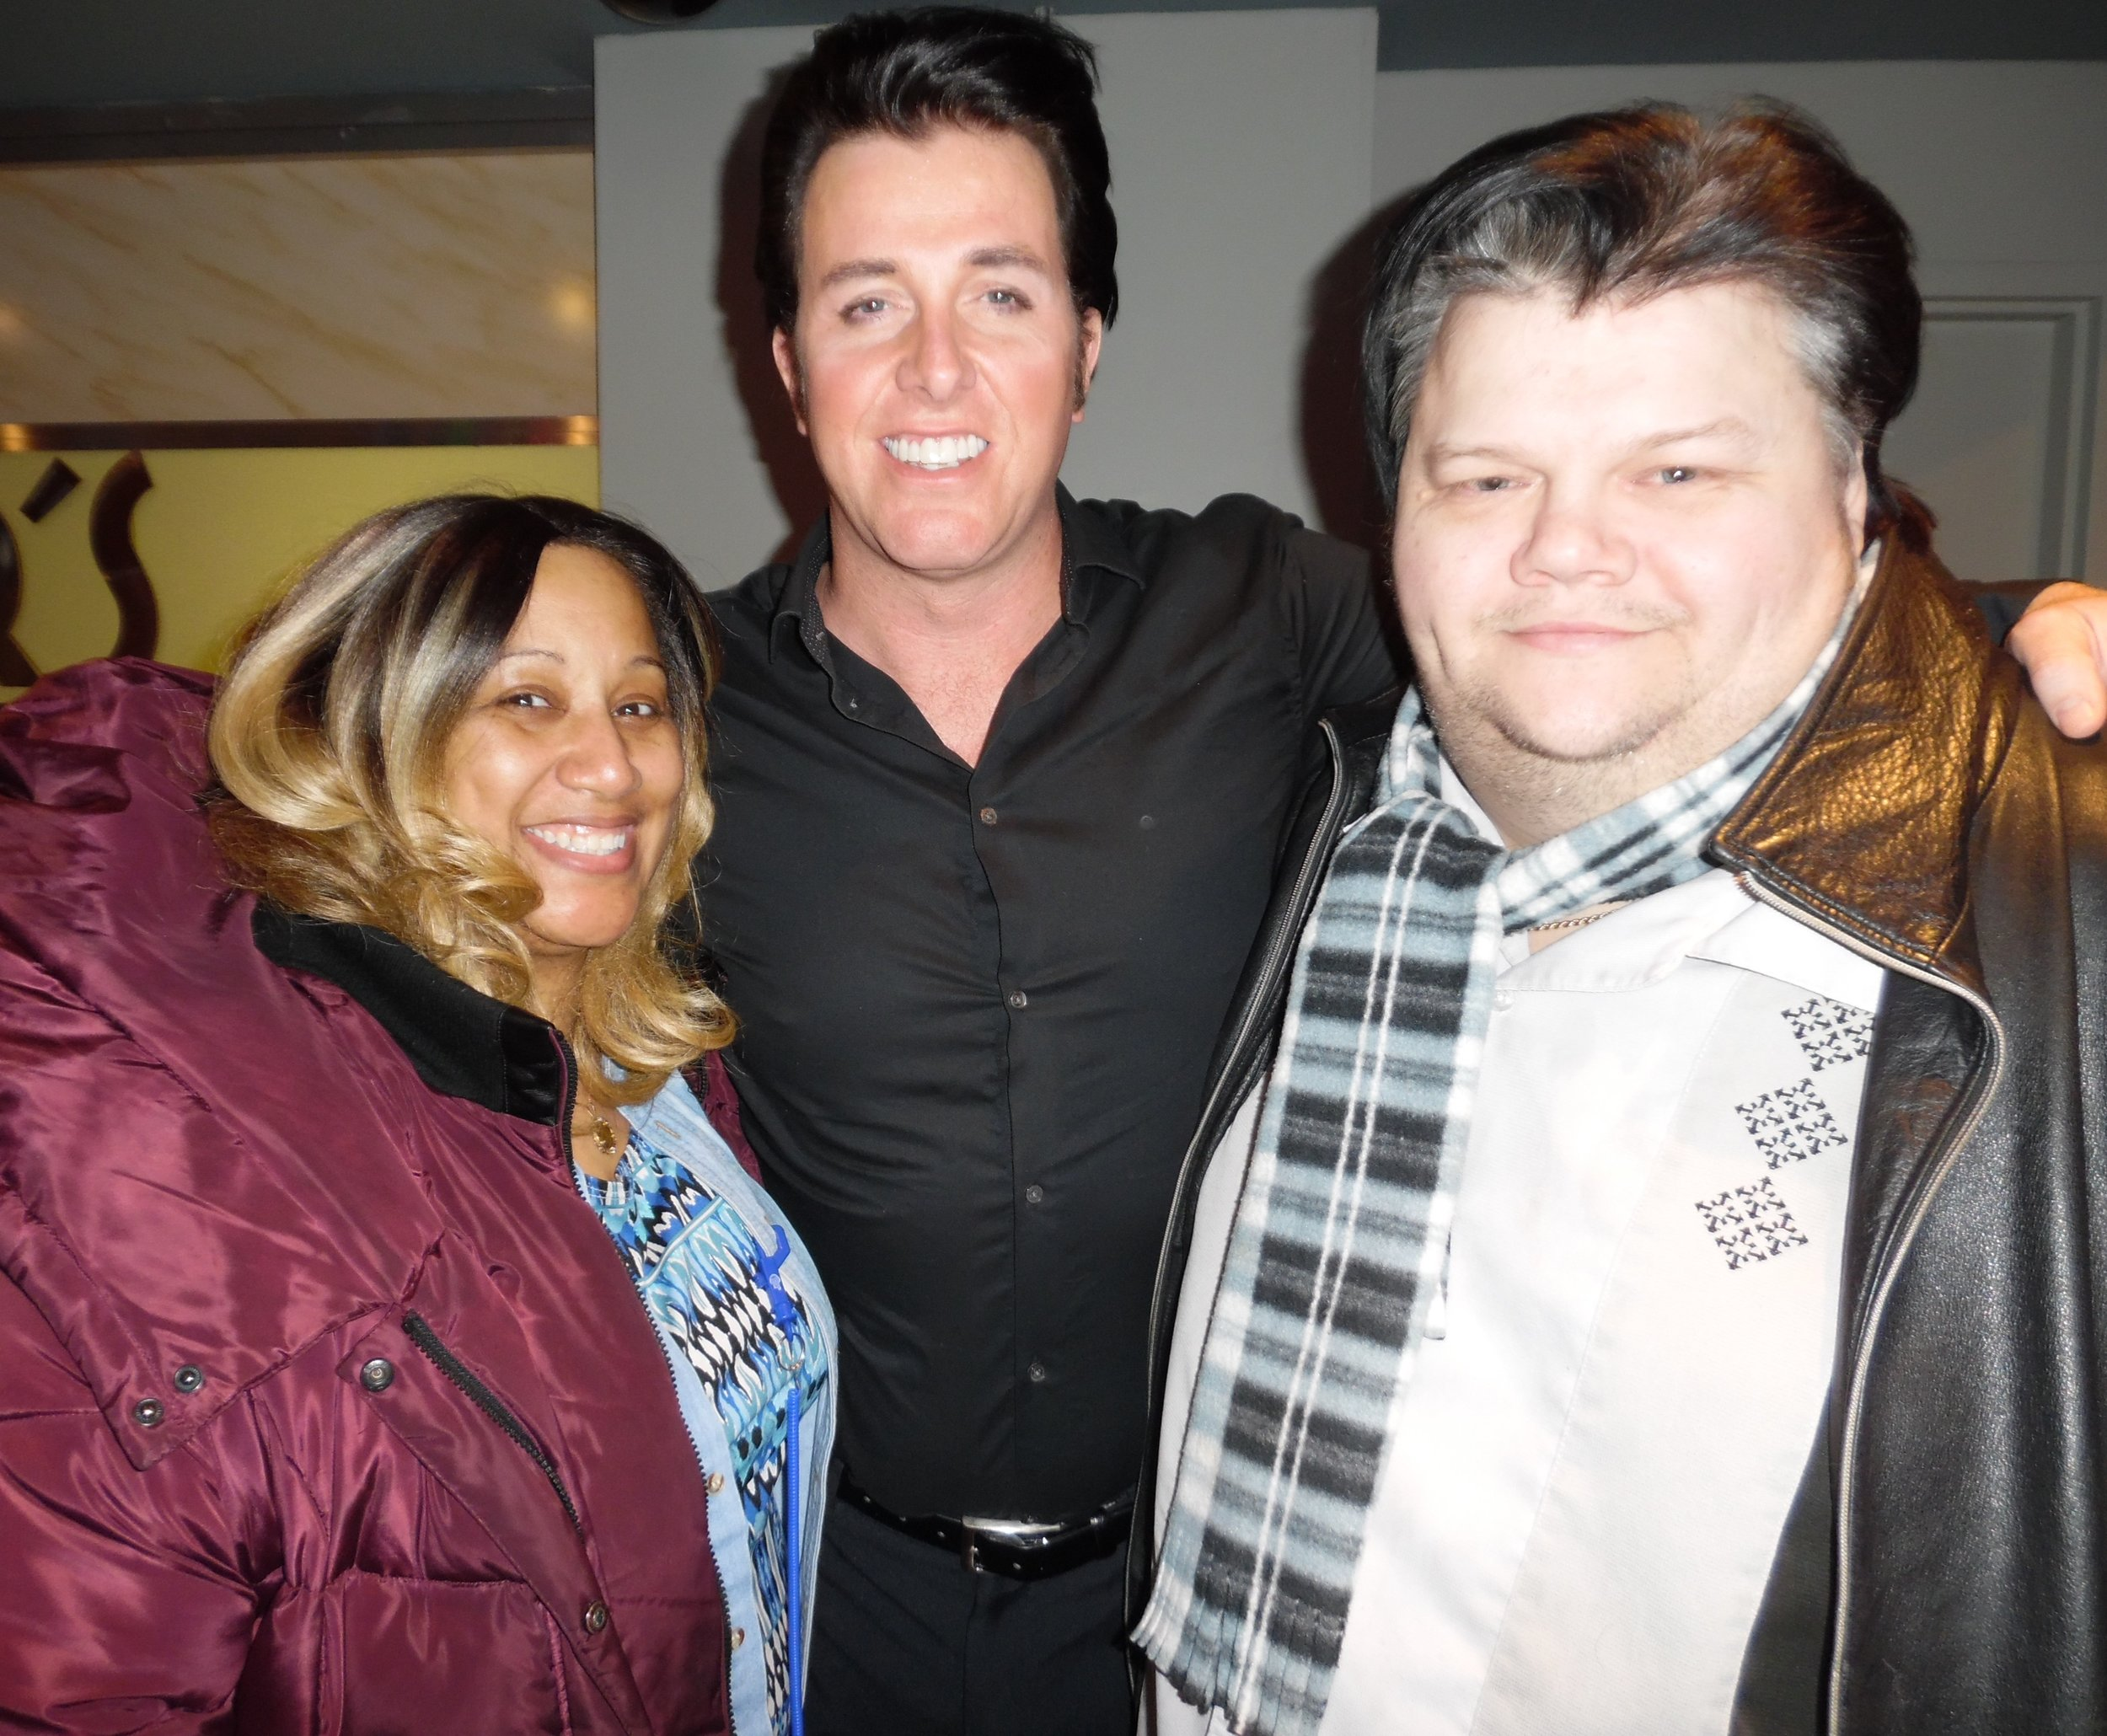 ETA  Matt Cage  with ETA  Chris Cooper  and Chris's fiancee, Tyra Johnson, at Matt's show at Mohawk Raceway, Friday, February 9th, 2018.